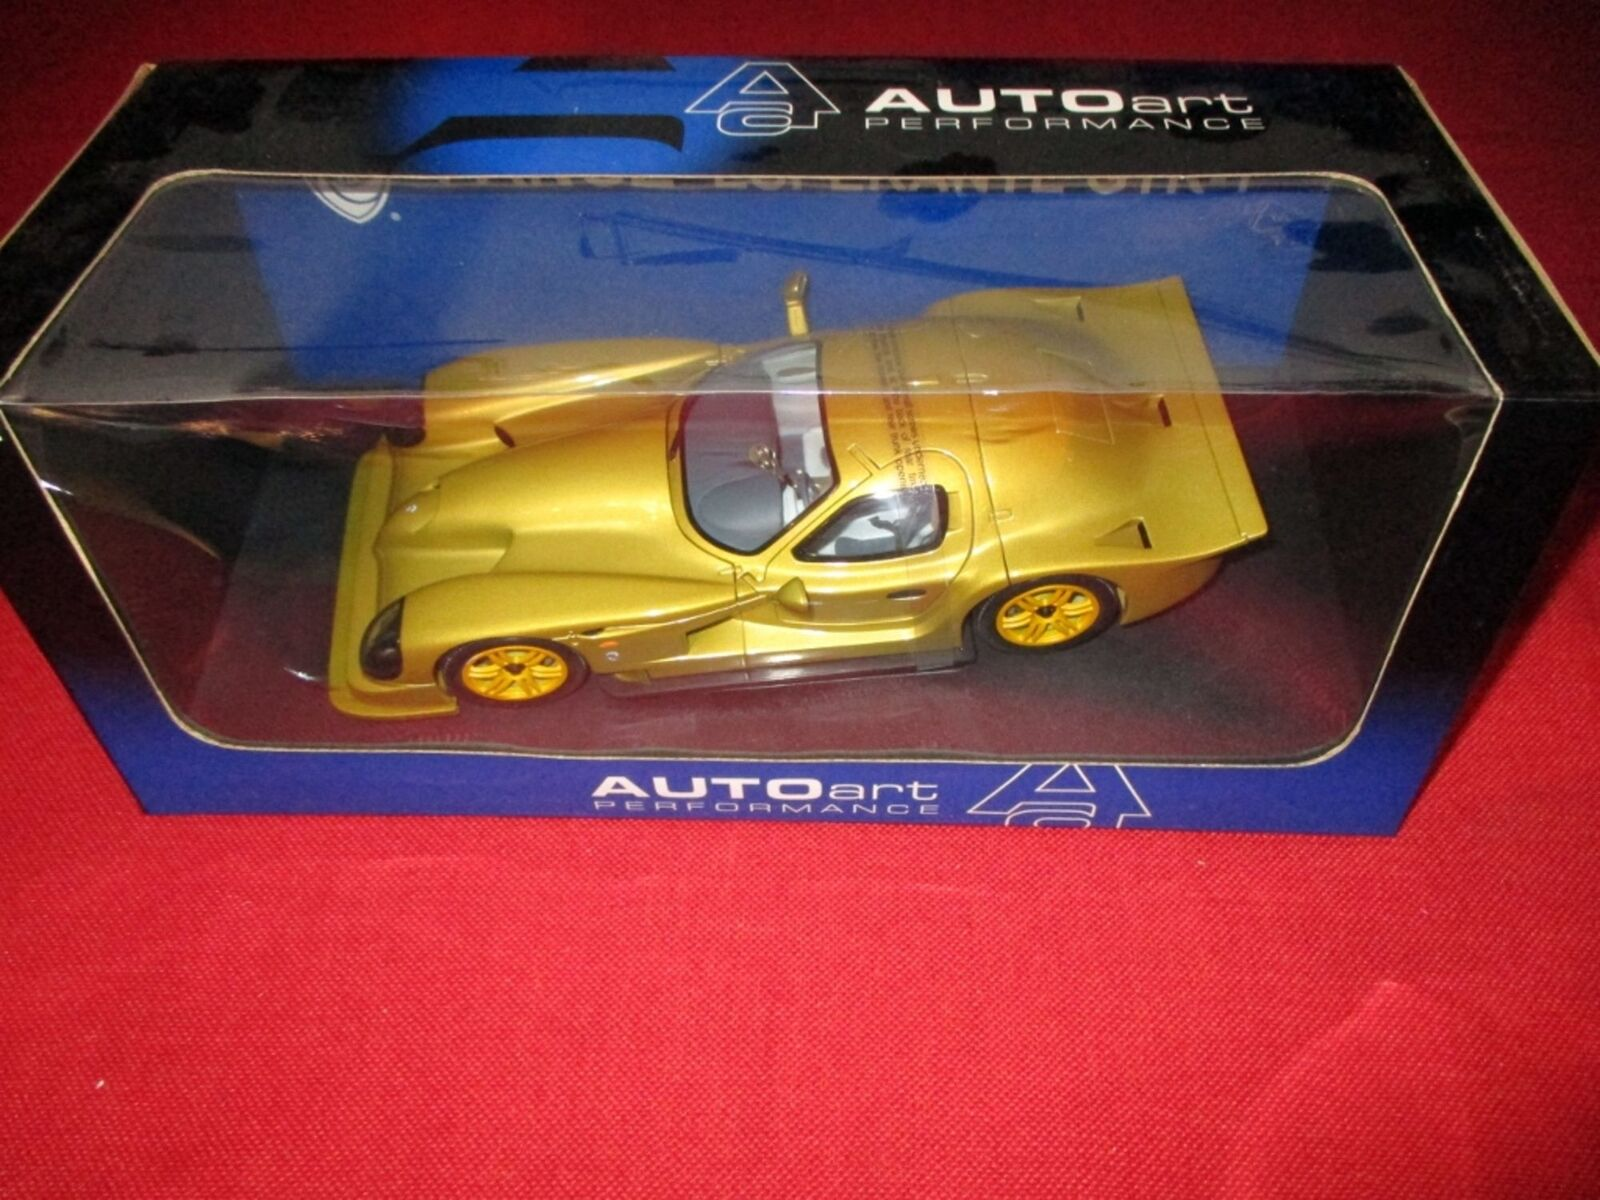 AUTOart™ PERFORMANCE 78202 1 18 Panoz Esperante GTR-1 Street Car '98 NEU OVP